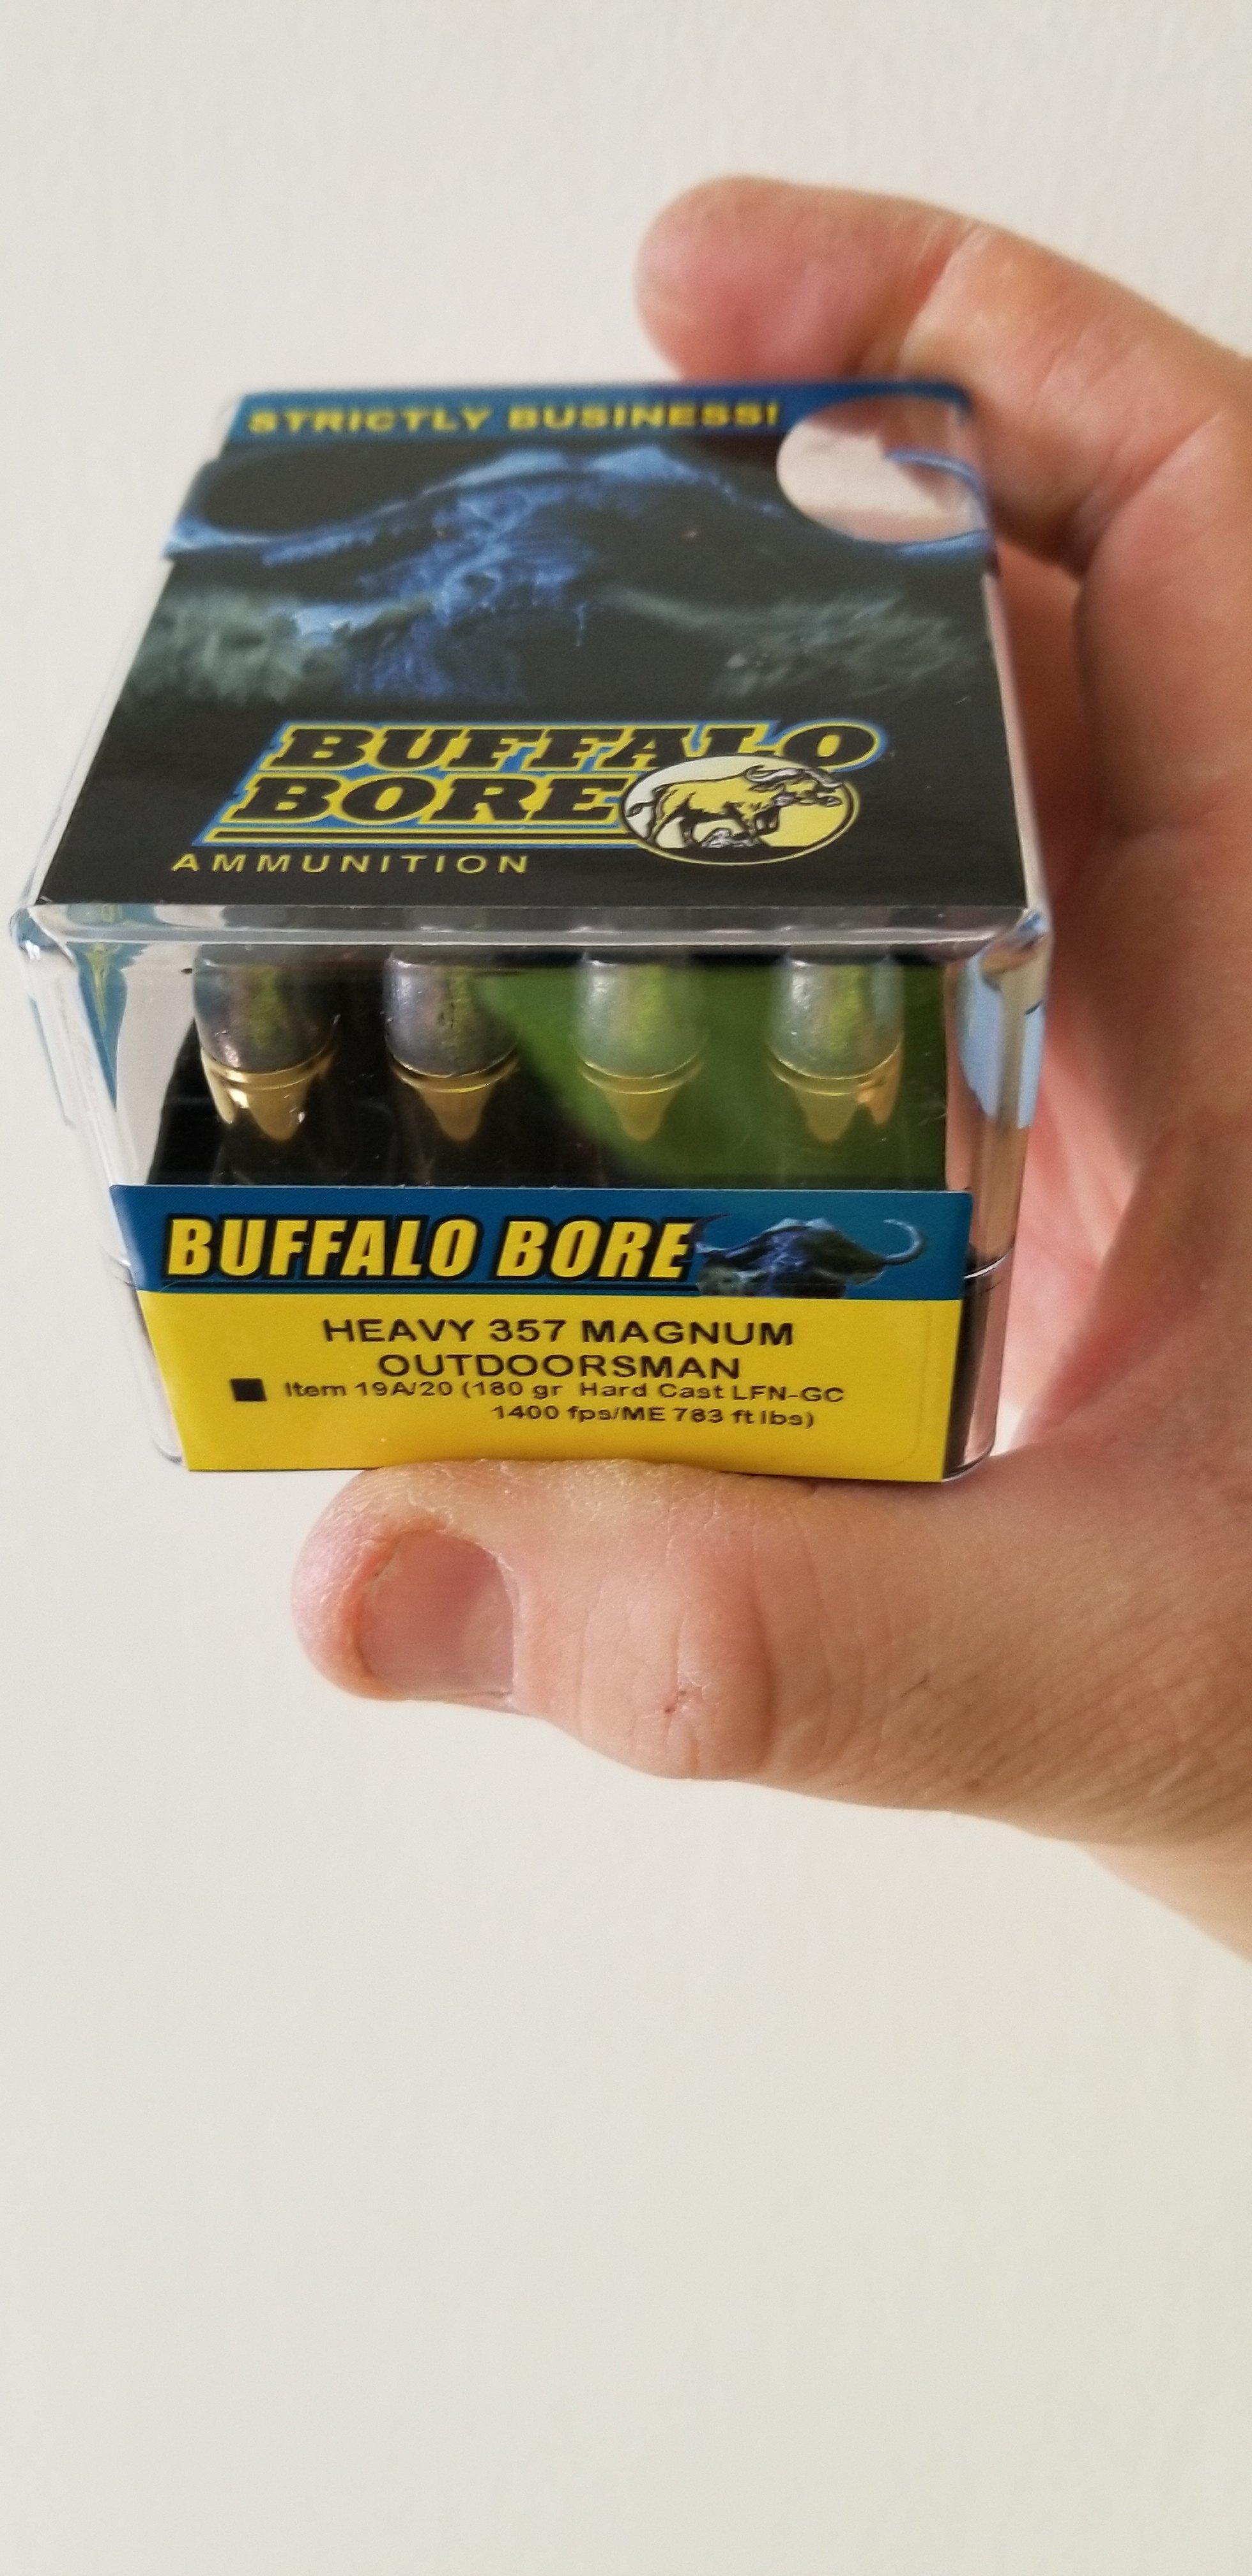 Buffalo Bore - Ammunition & Reloading - New Jersey Gun Forums